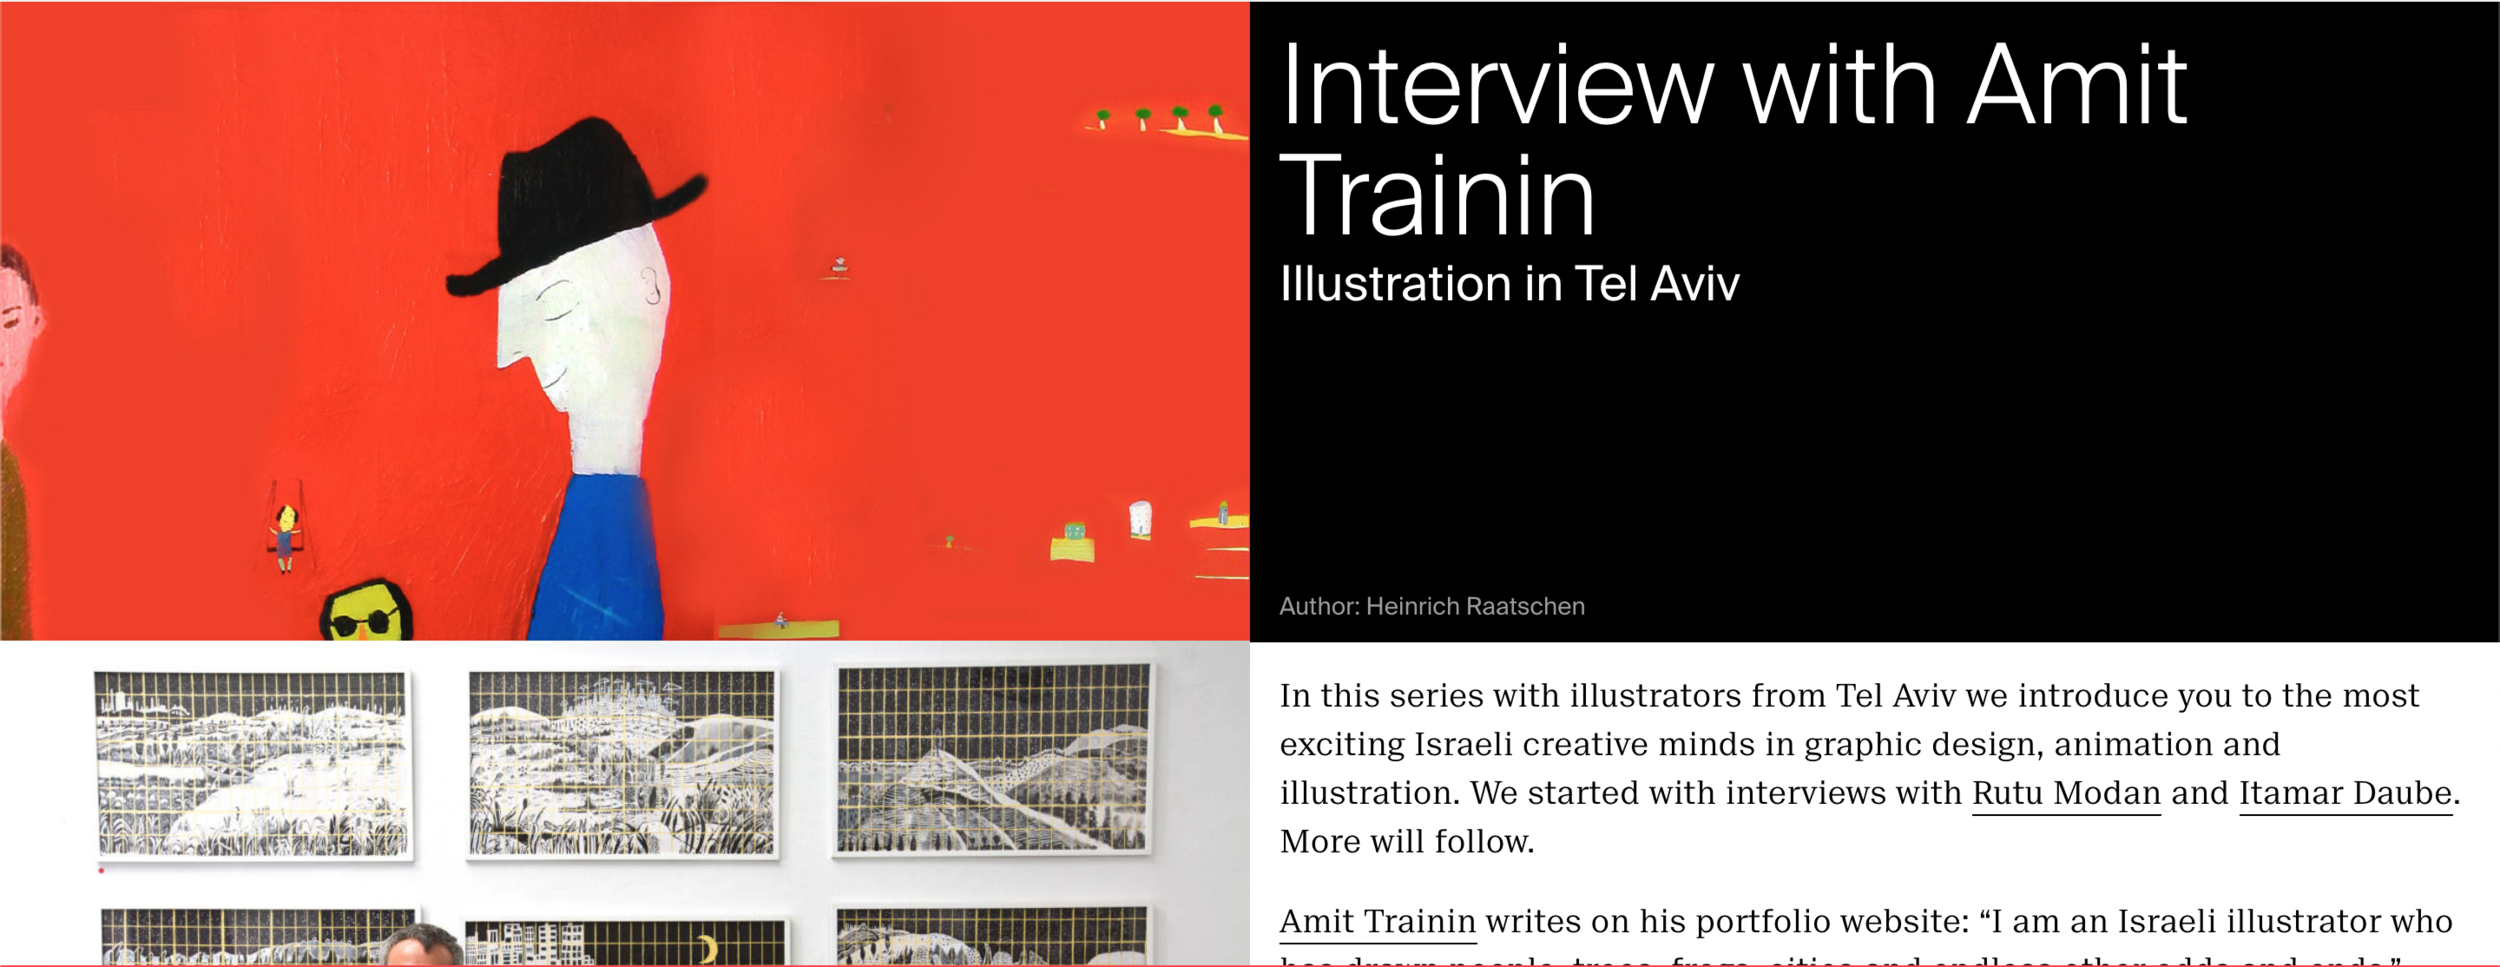 Slanted - ראיון במגזין לעיצוב